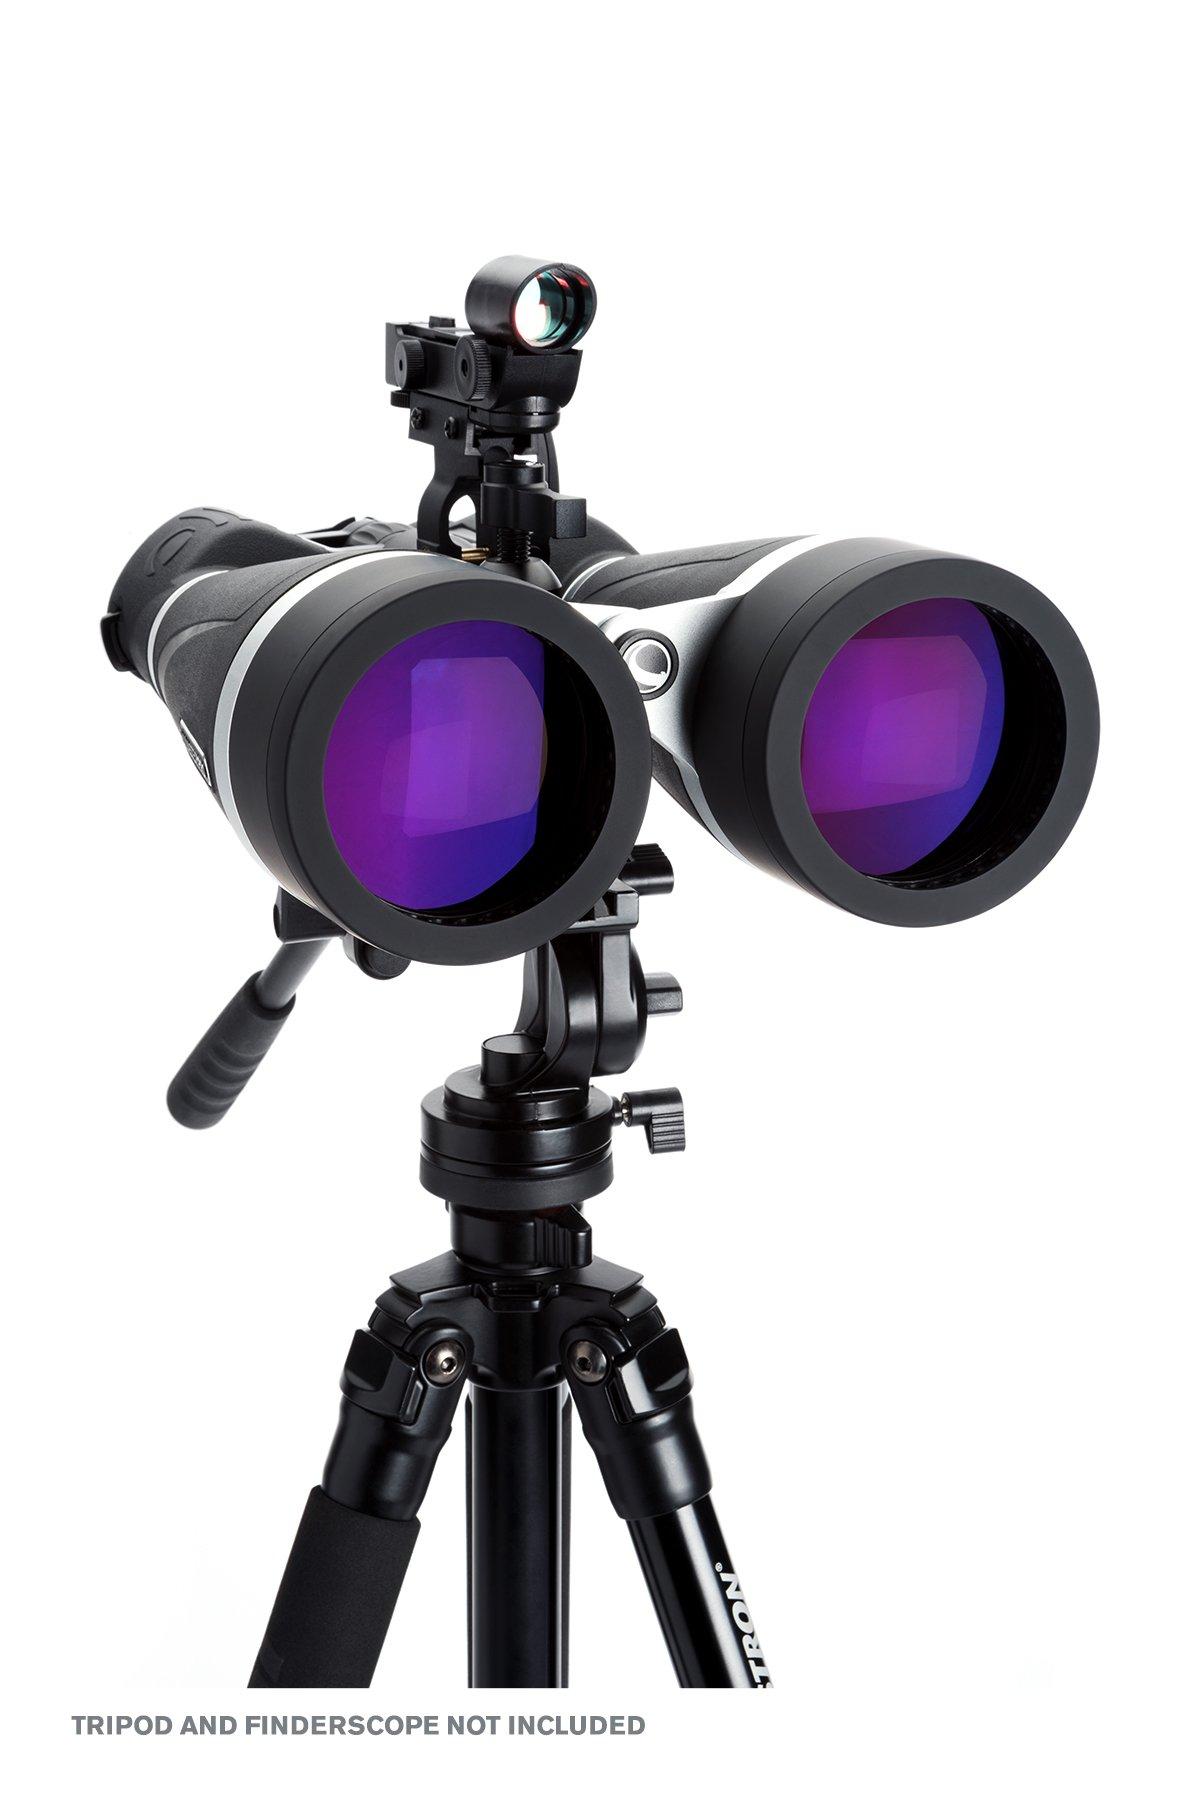 Celestron 20x80 SkyMaster Pro High Power Astronomy Binoculars by Celestron (Image #6)